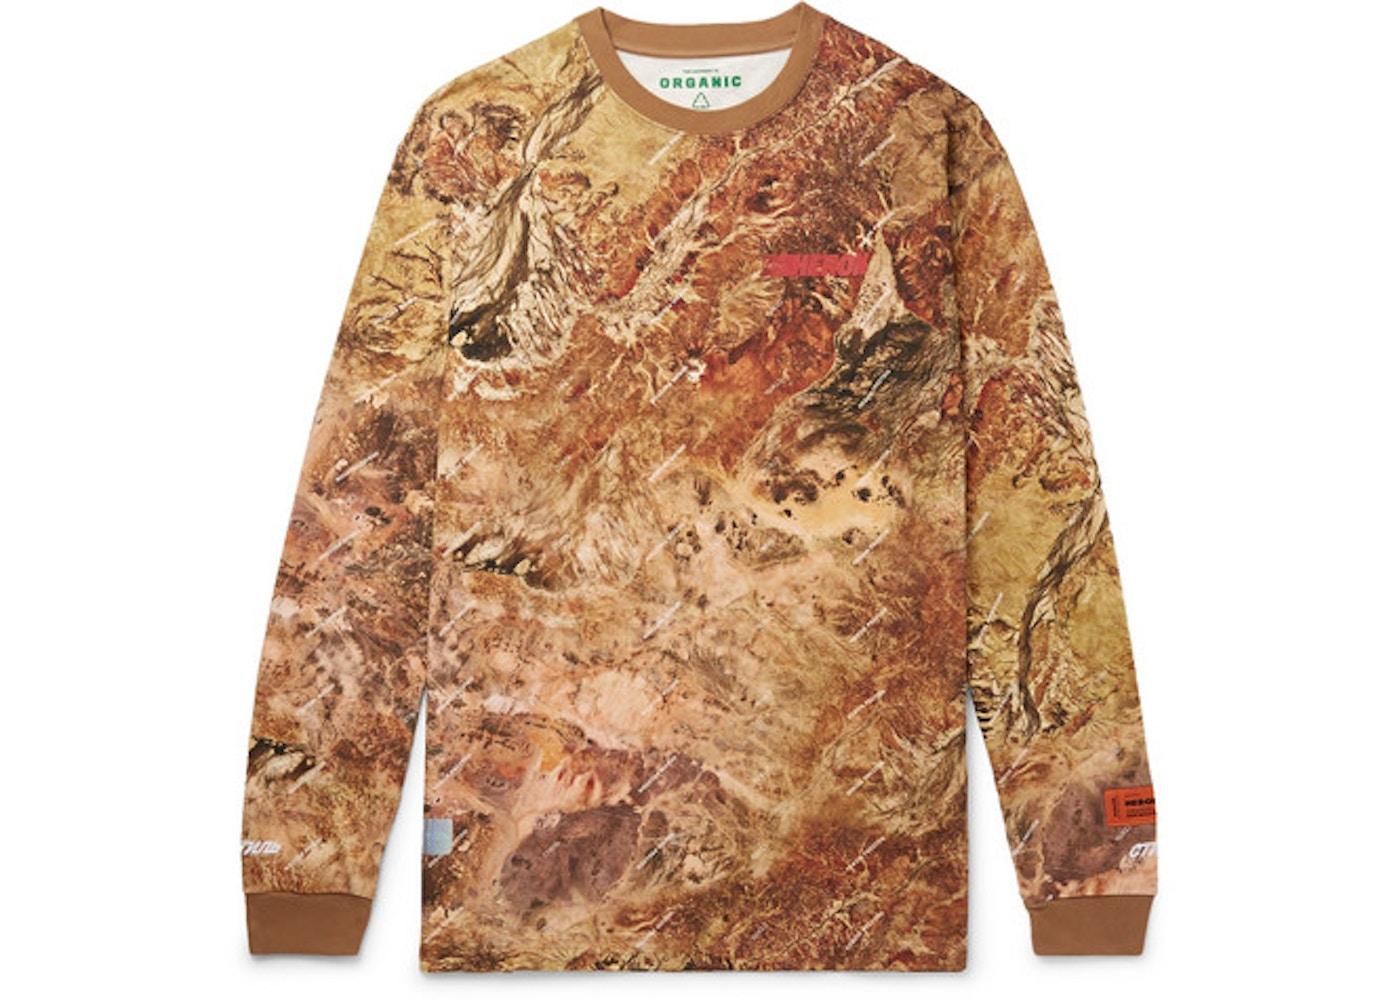 9c77ba30 Heron Preston Australian Outback Print L/S T-Shirt Orange/Multicolor ...